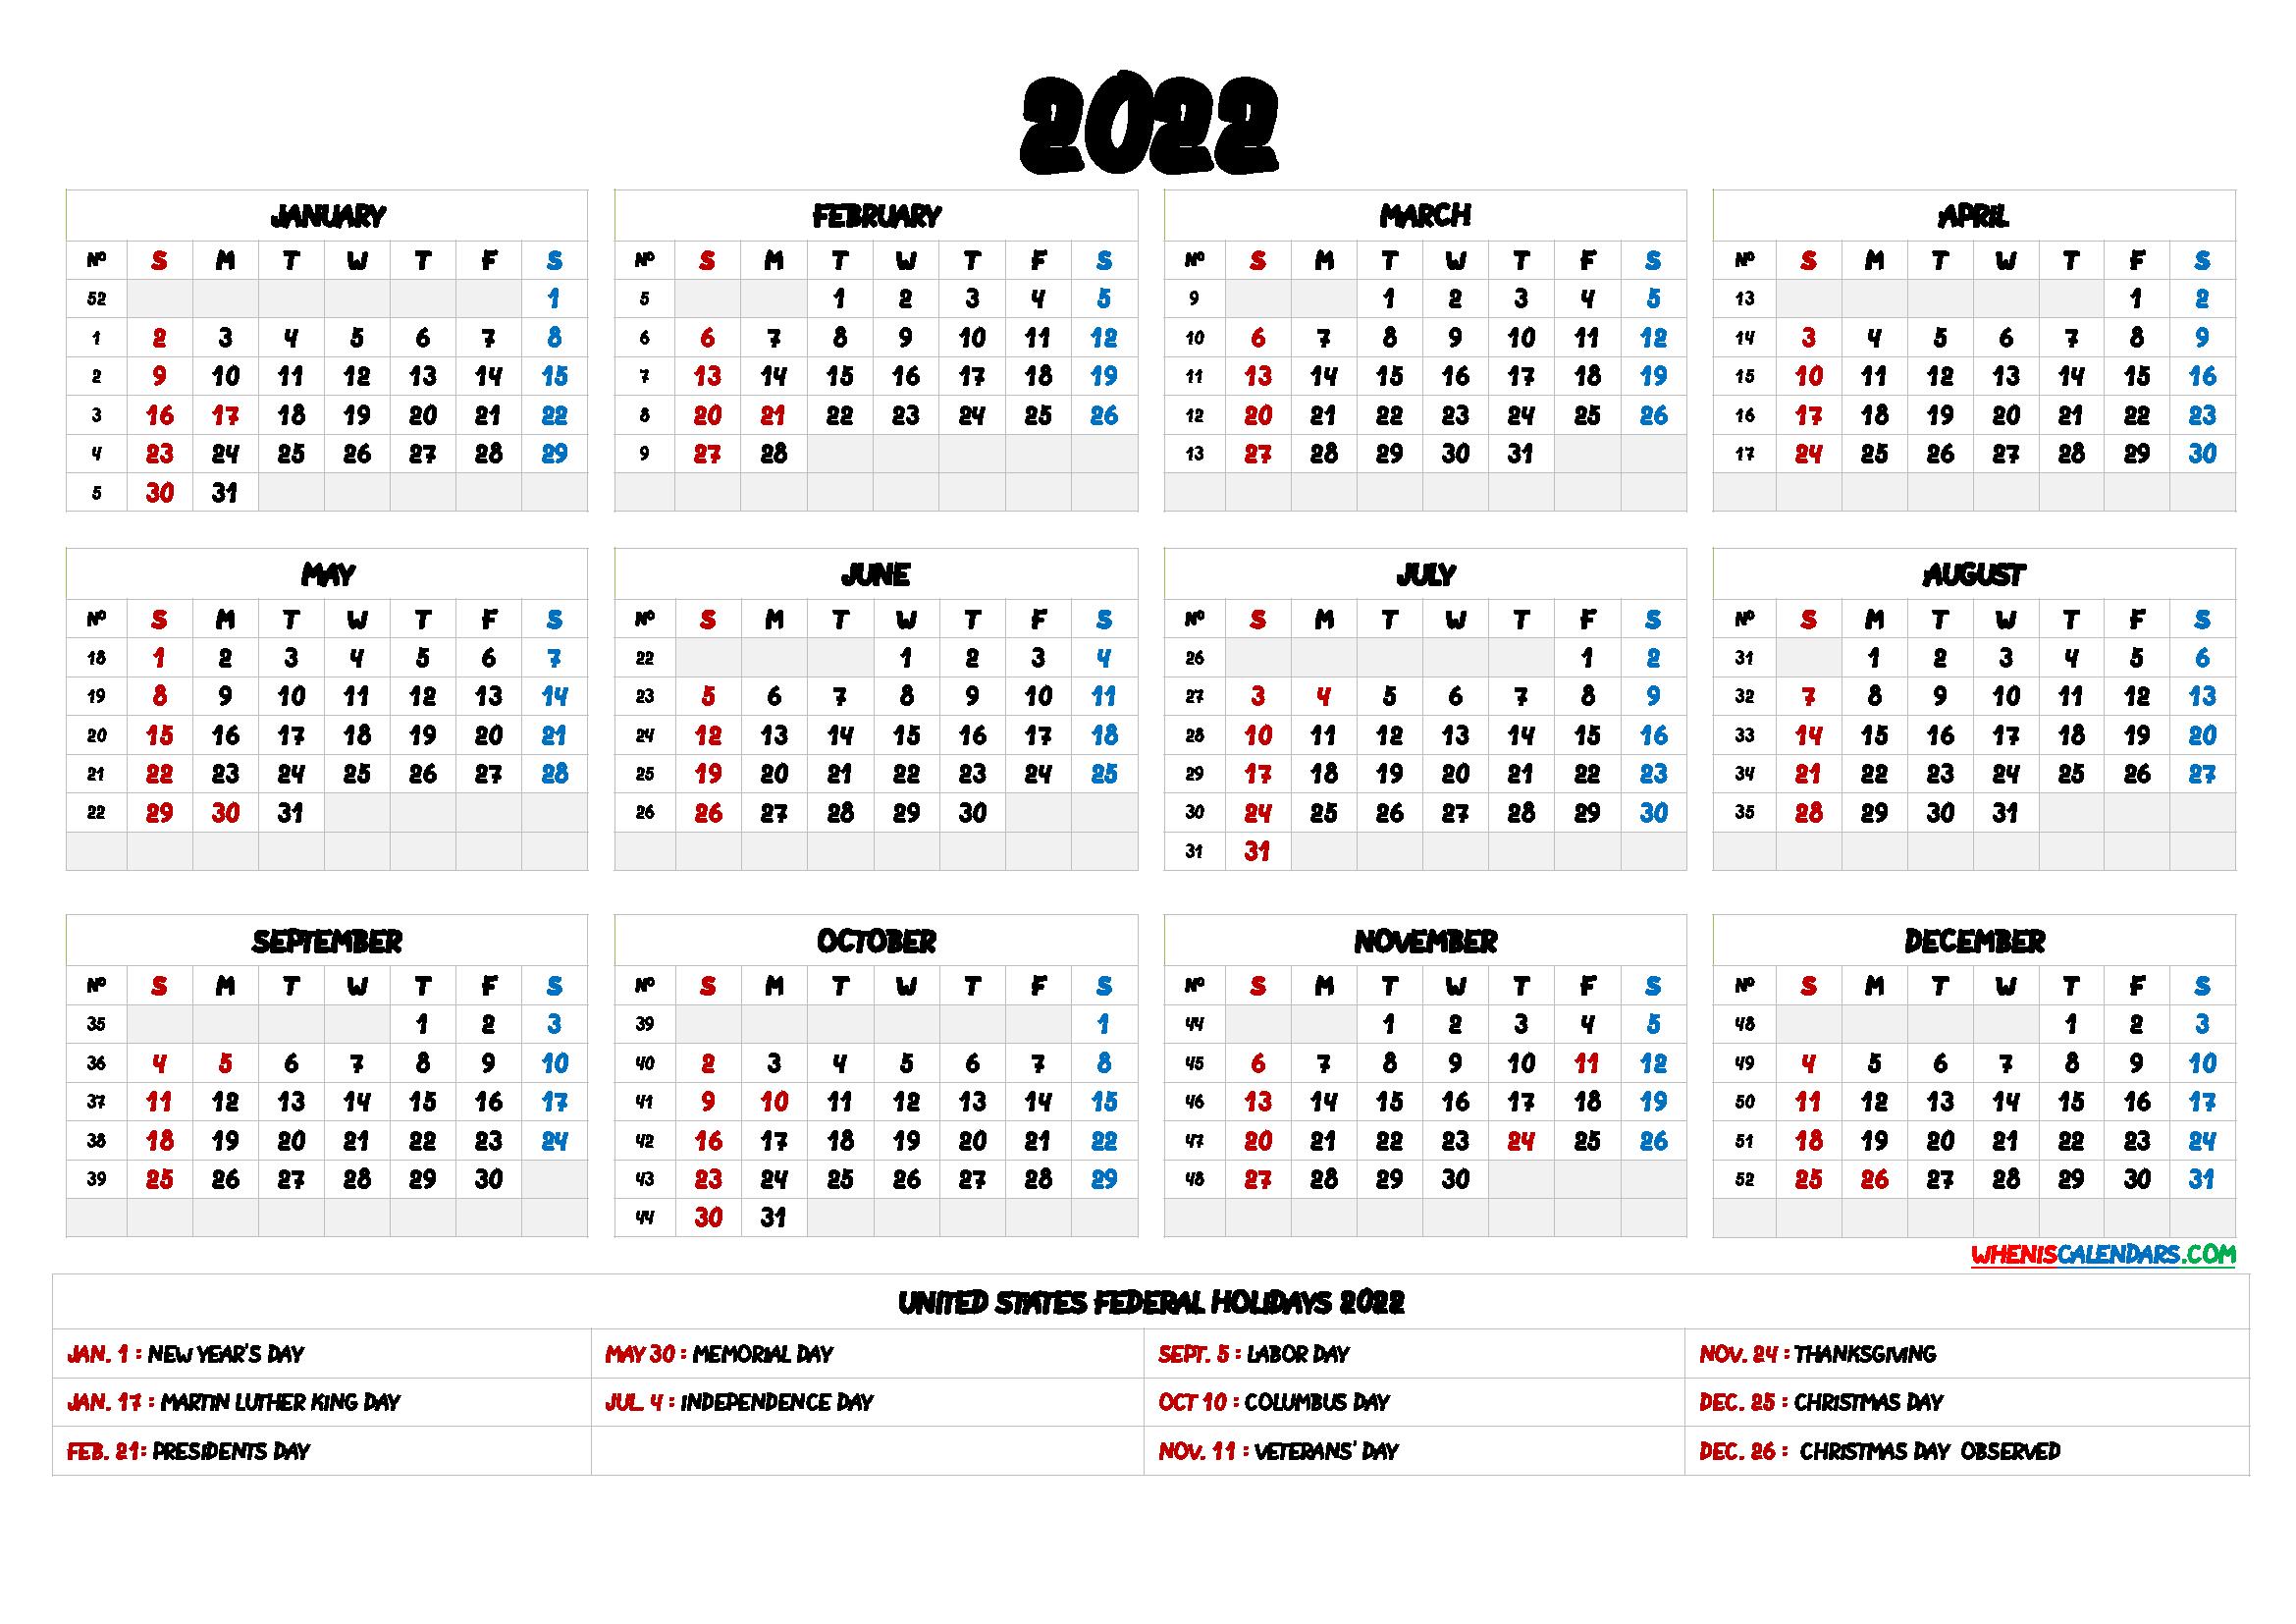 One Page Calendar 2022.2022 One Page Calendar Printable 6 Templates Calendar Printables Free Printable Calendar Printable Yearly Calendar